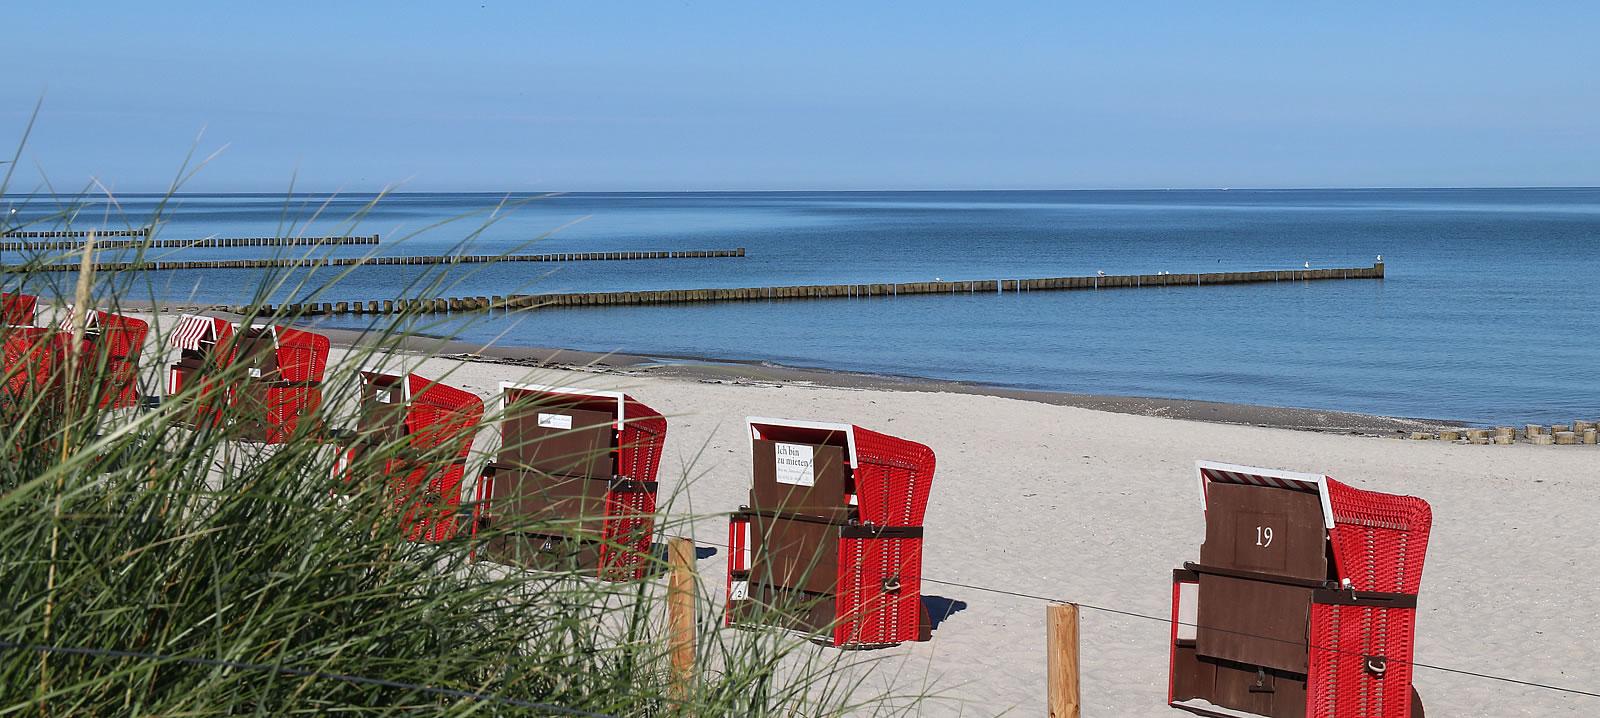 Strandkörbe von unserem Romantik Hotel am Strand